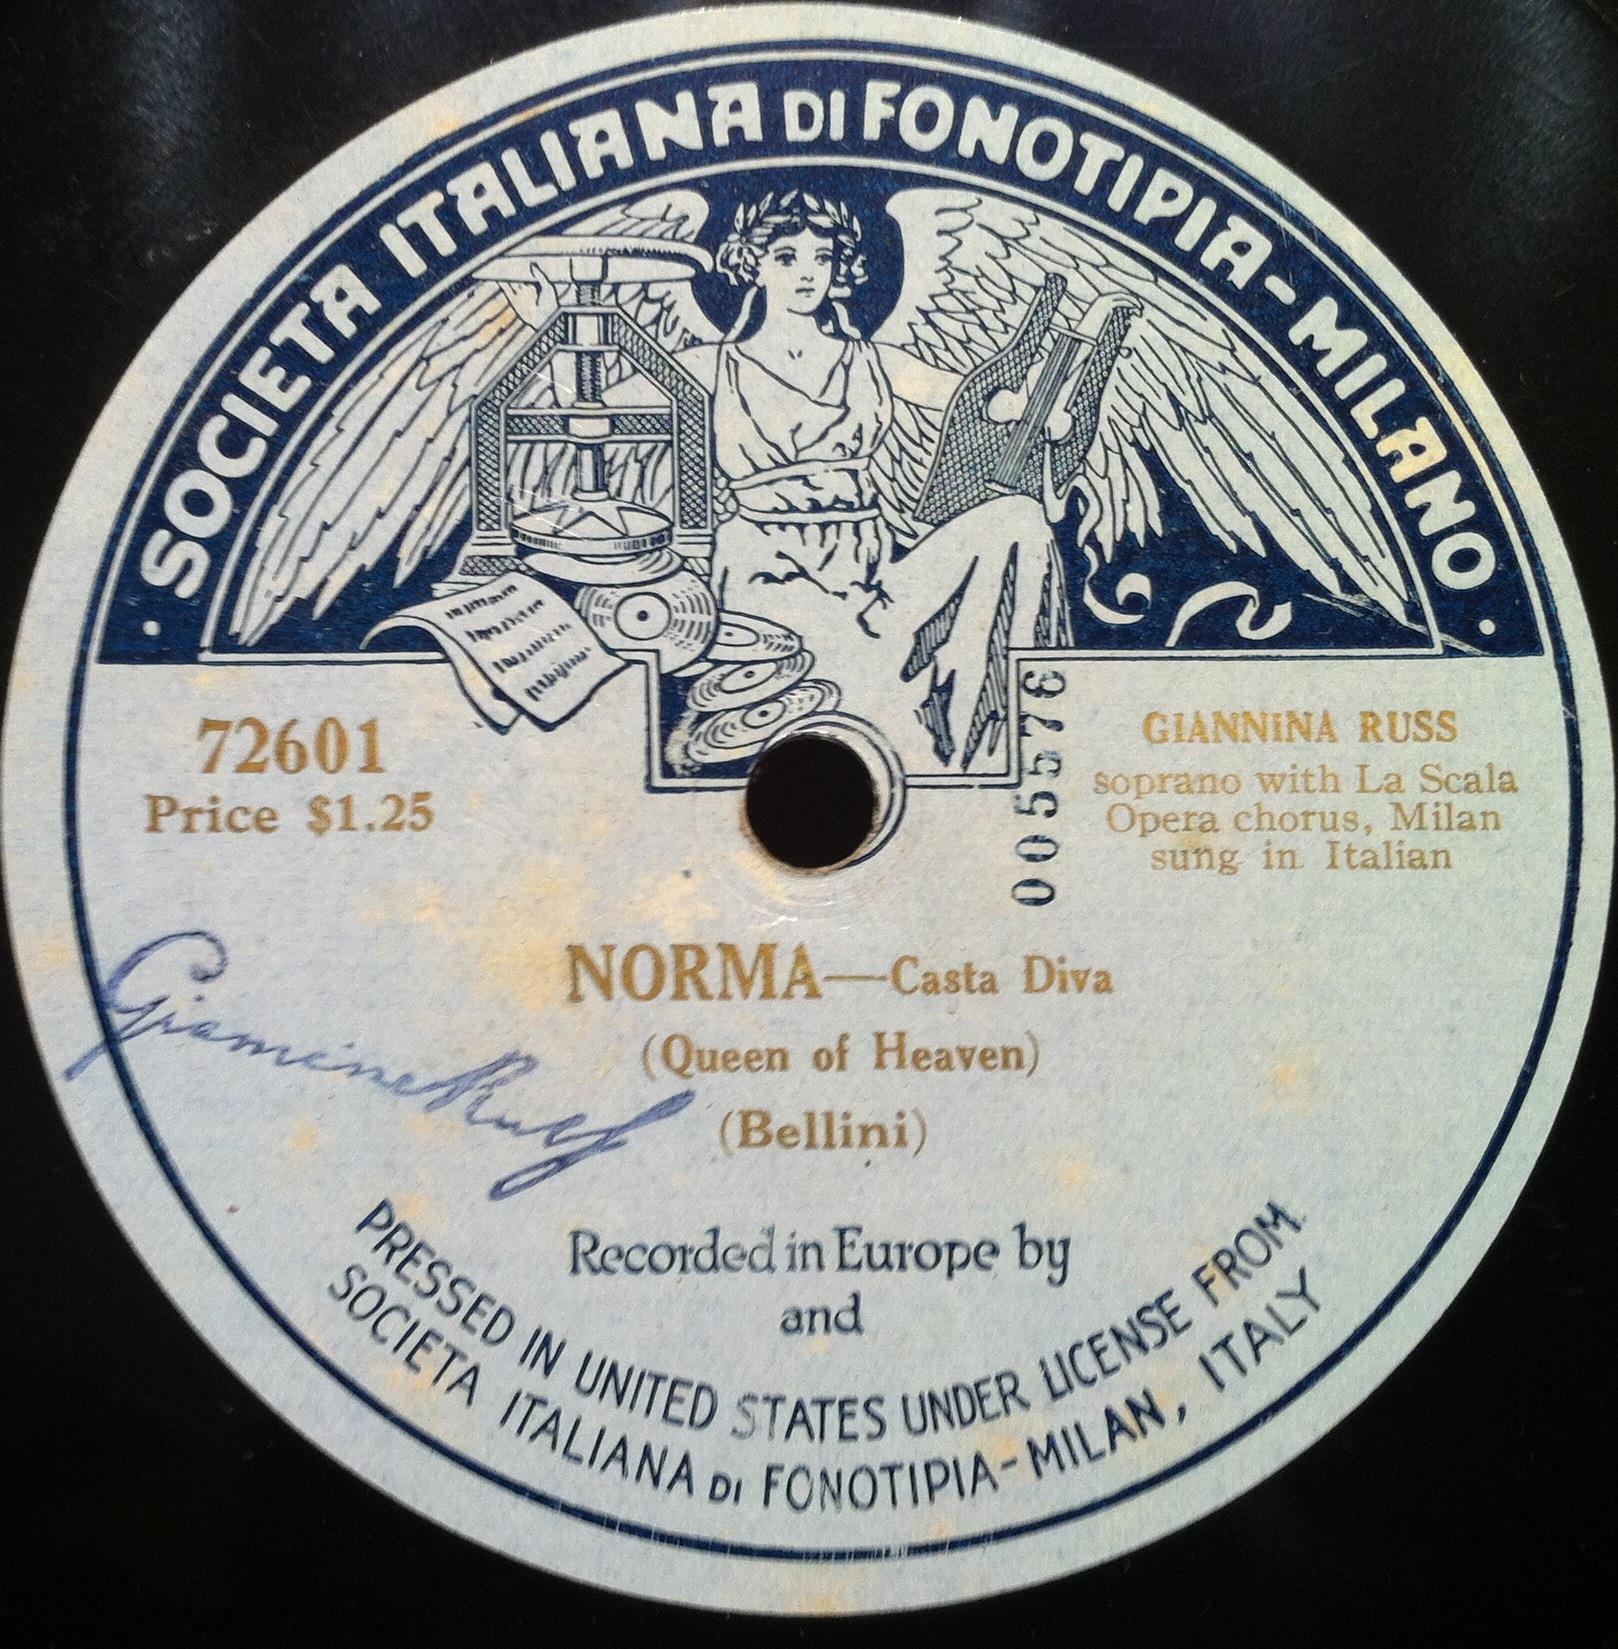 Giannina russ bellini norma casta diva 10 vg 72601 rare italian 78 single sided - Norma casta diva bellini ...